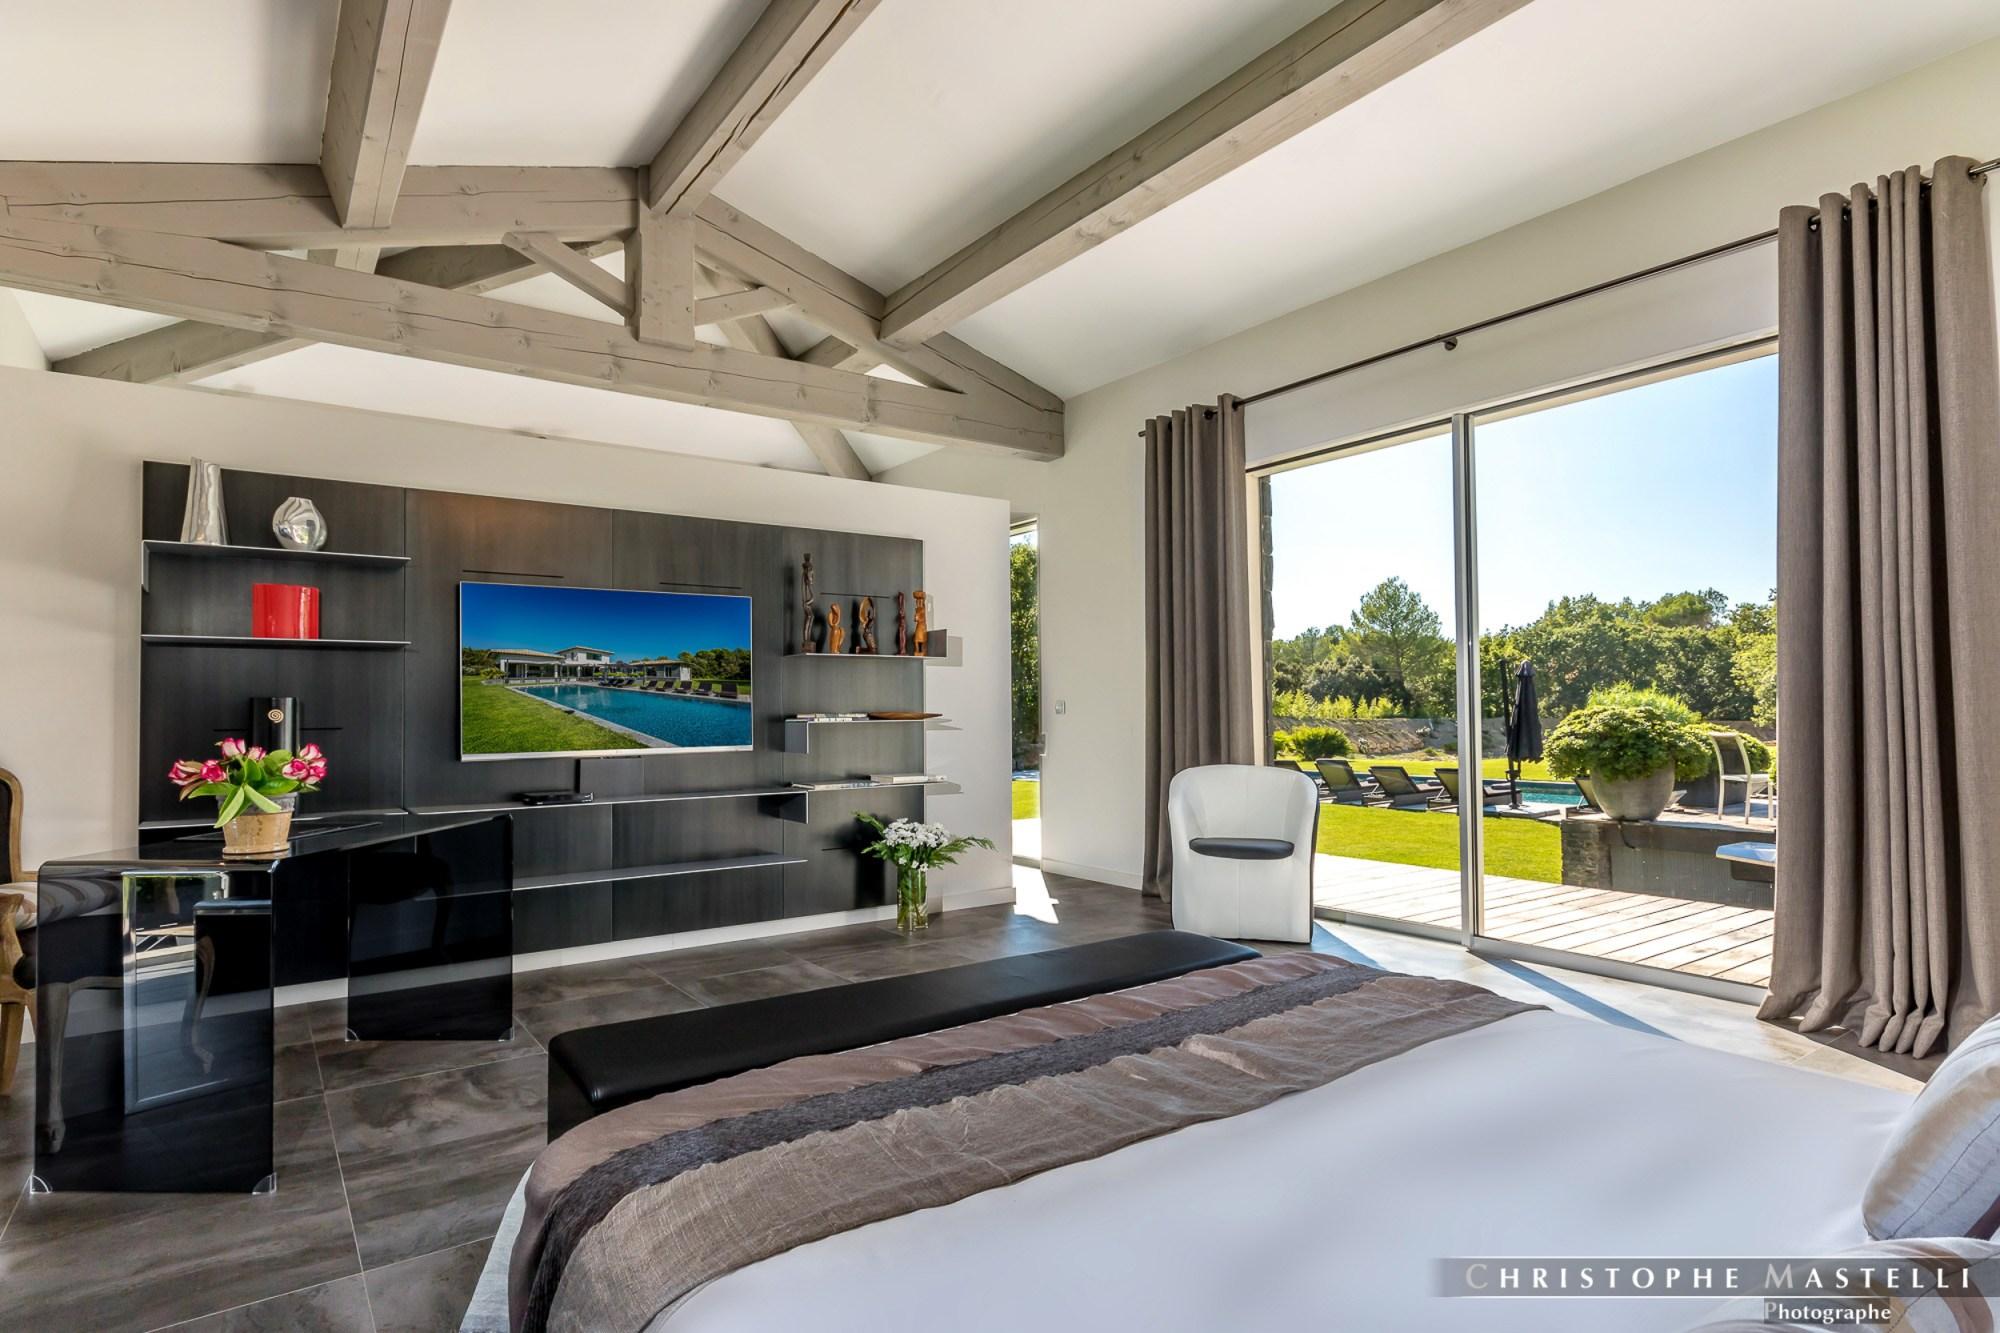 christophe mastelli photographe immobilier proprietes luxe paca